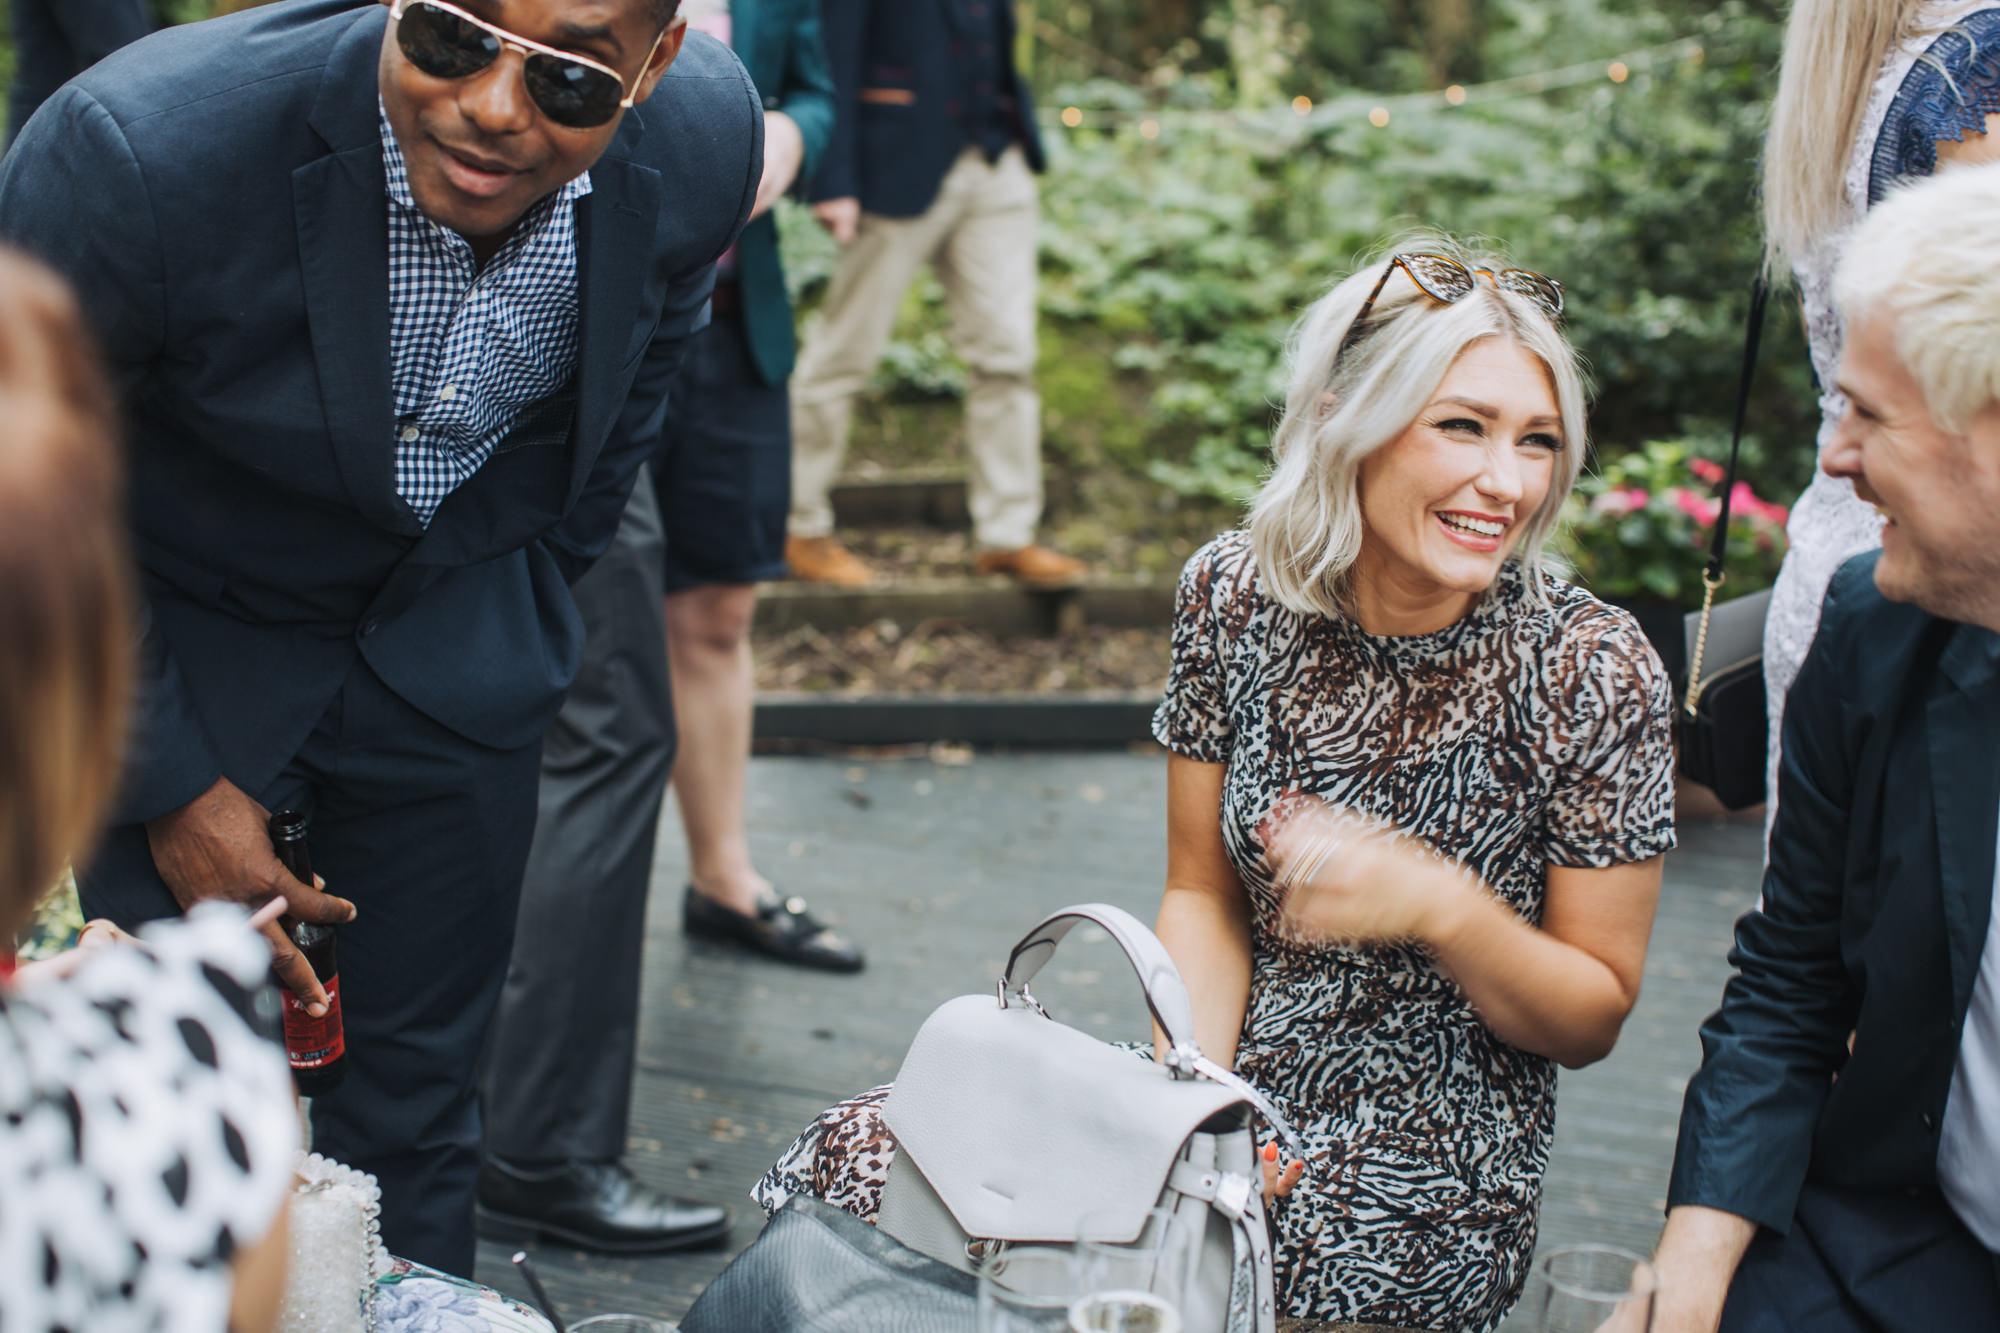 applewood wedding photographer leeds, yorkshire22.jpg